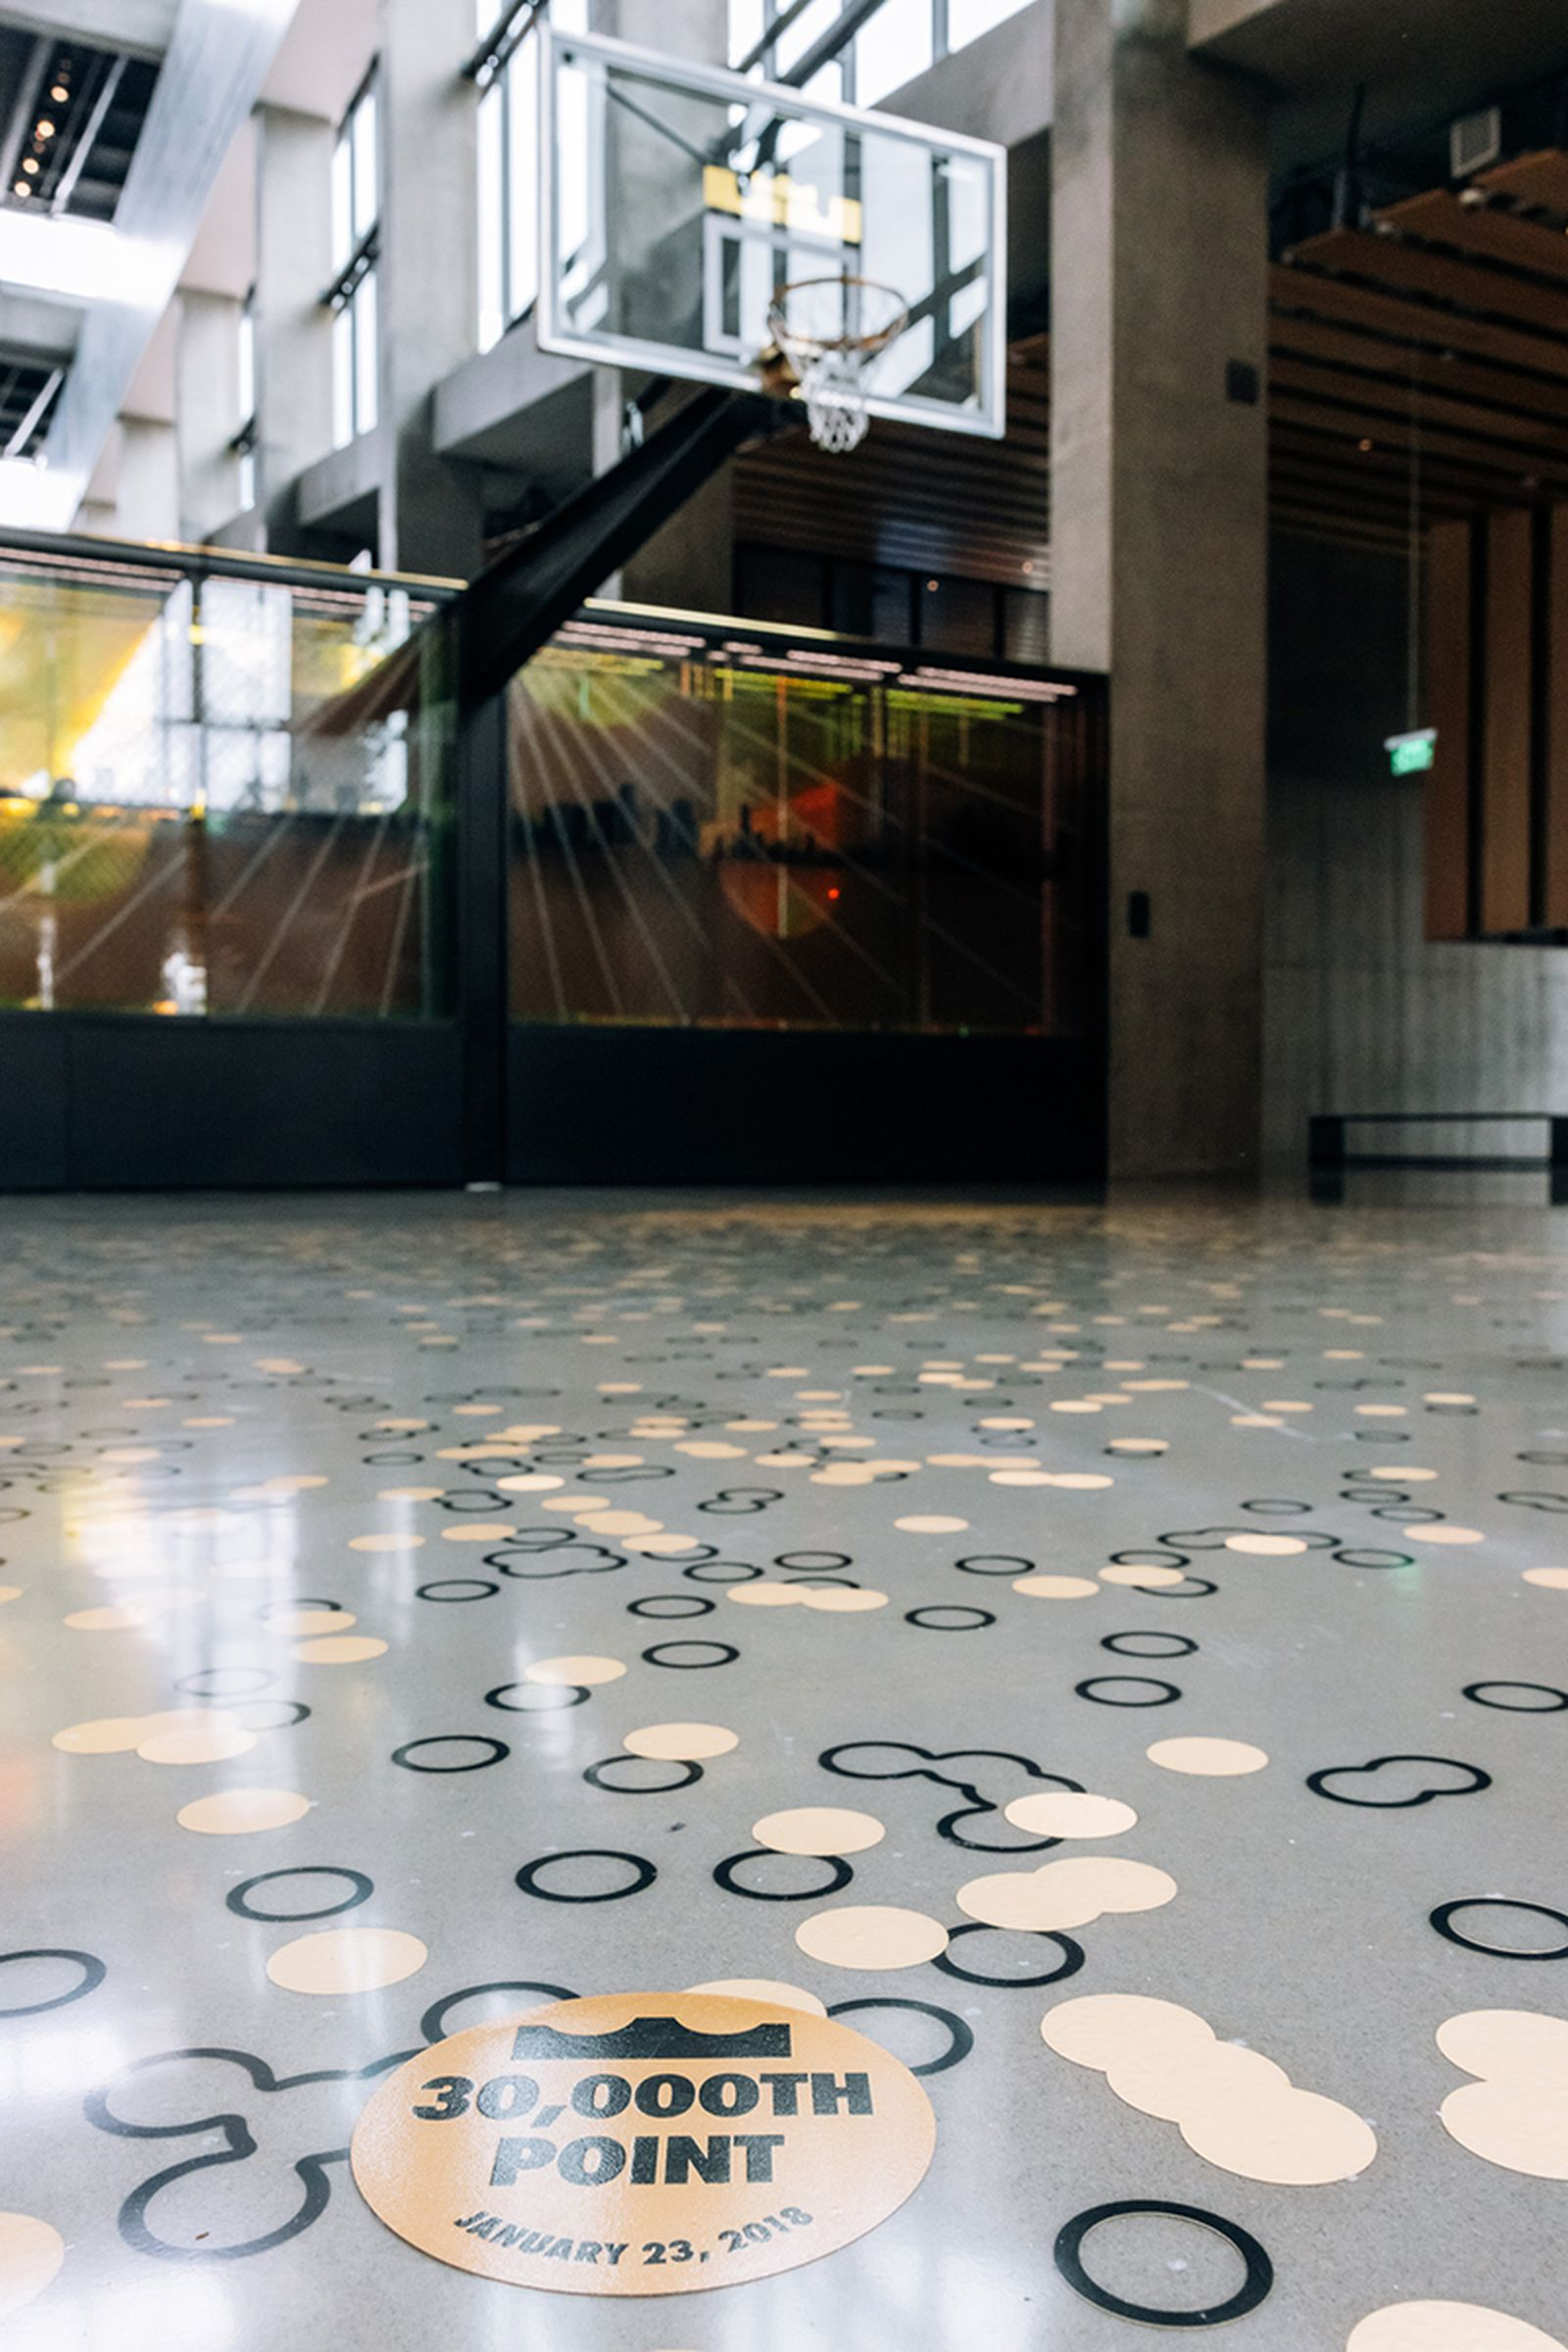 nike-lebron-james-innovation-center- (8)